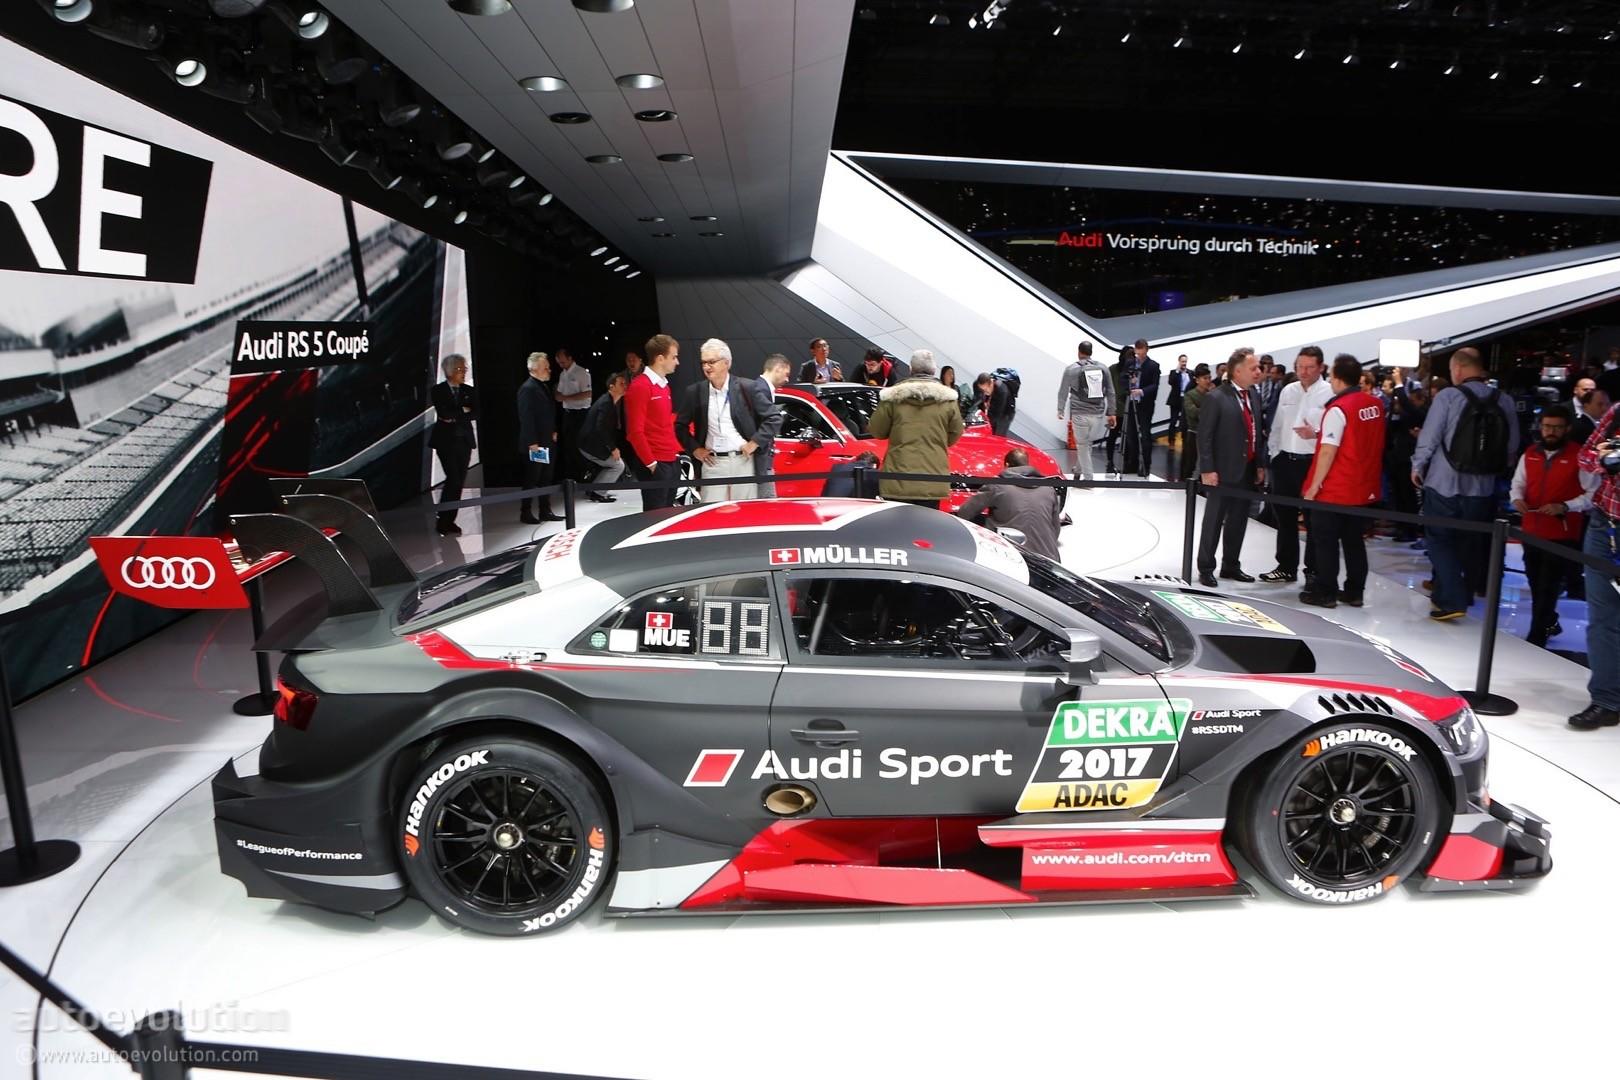 New Audi Rs5 Dtm Looks Racy In Geneva Prepares To Defend